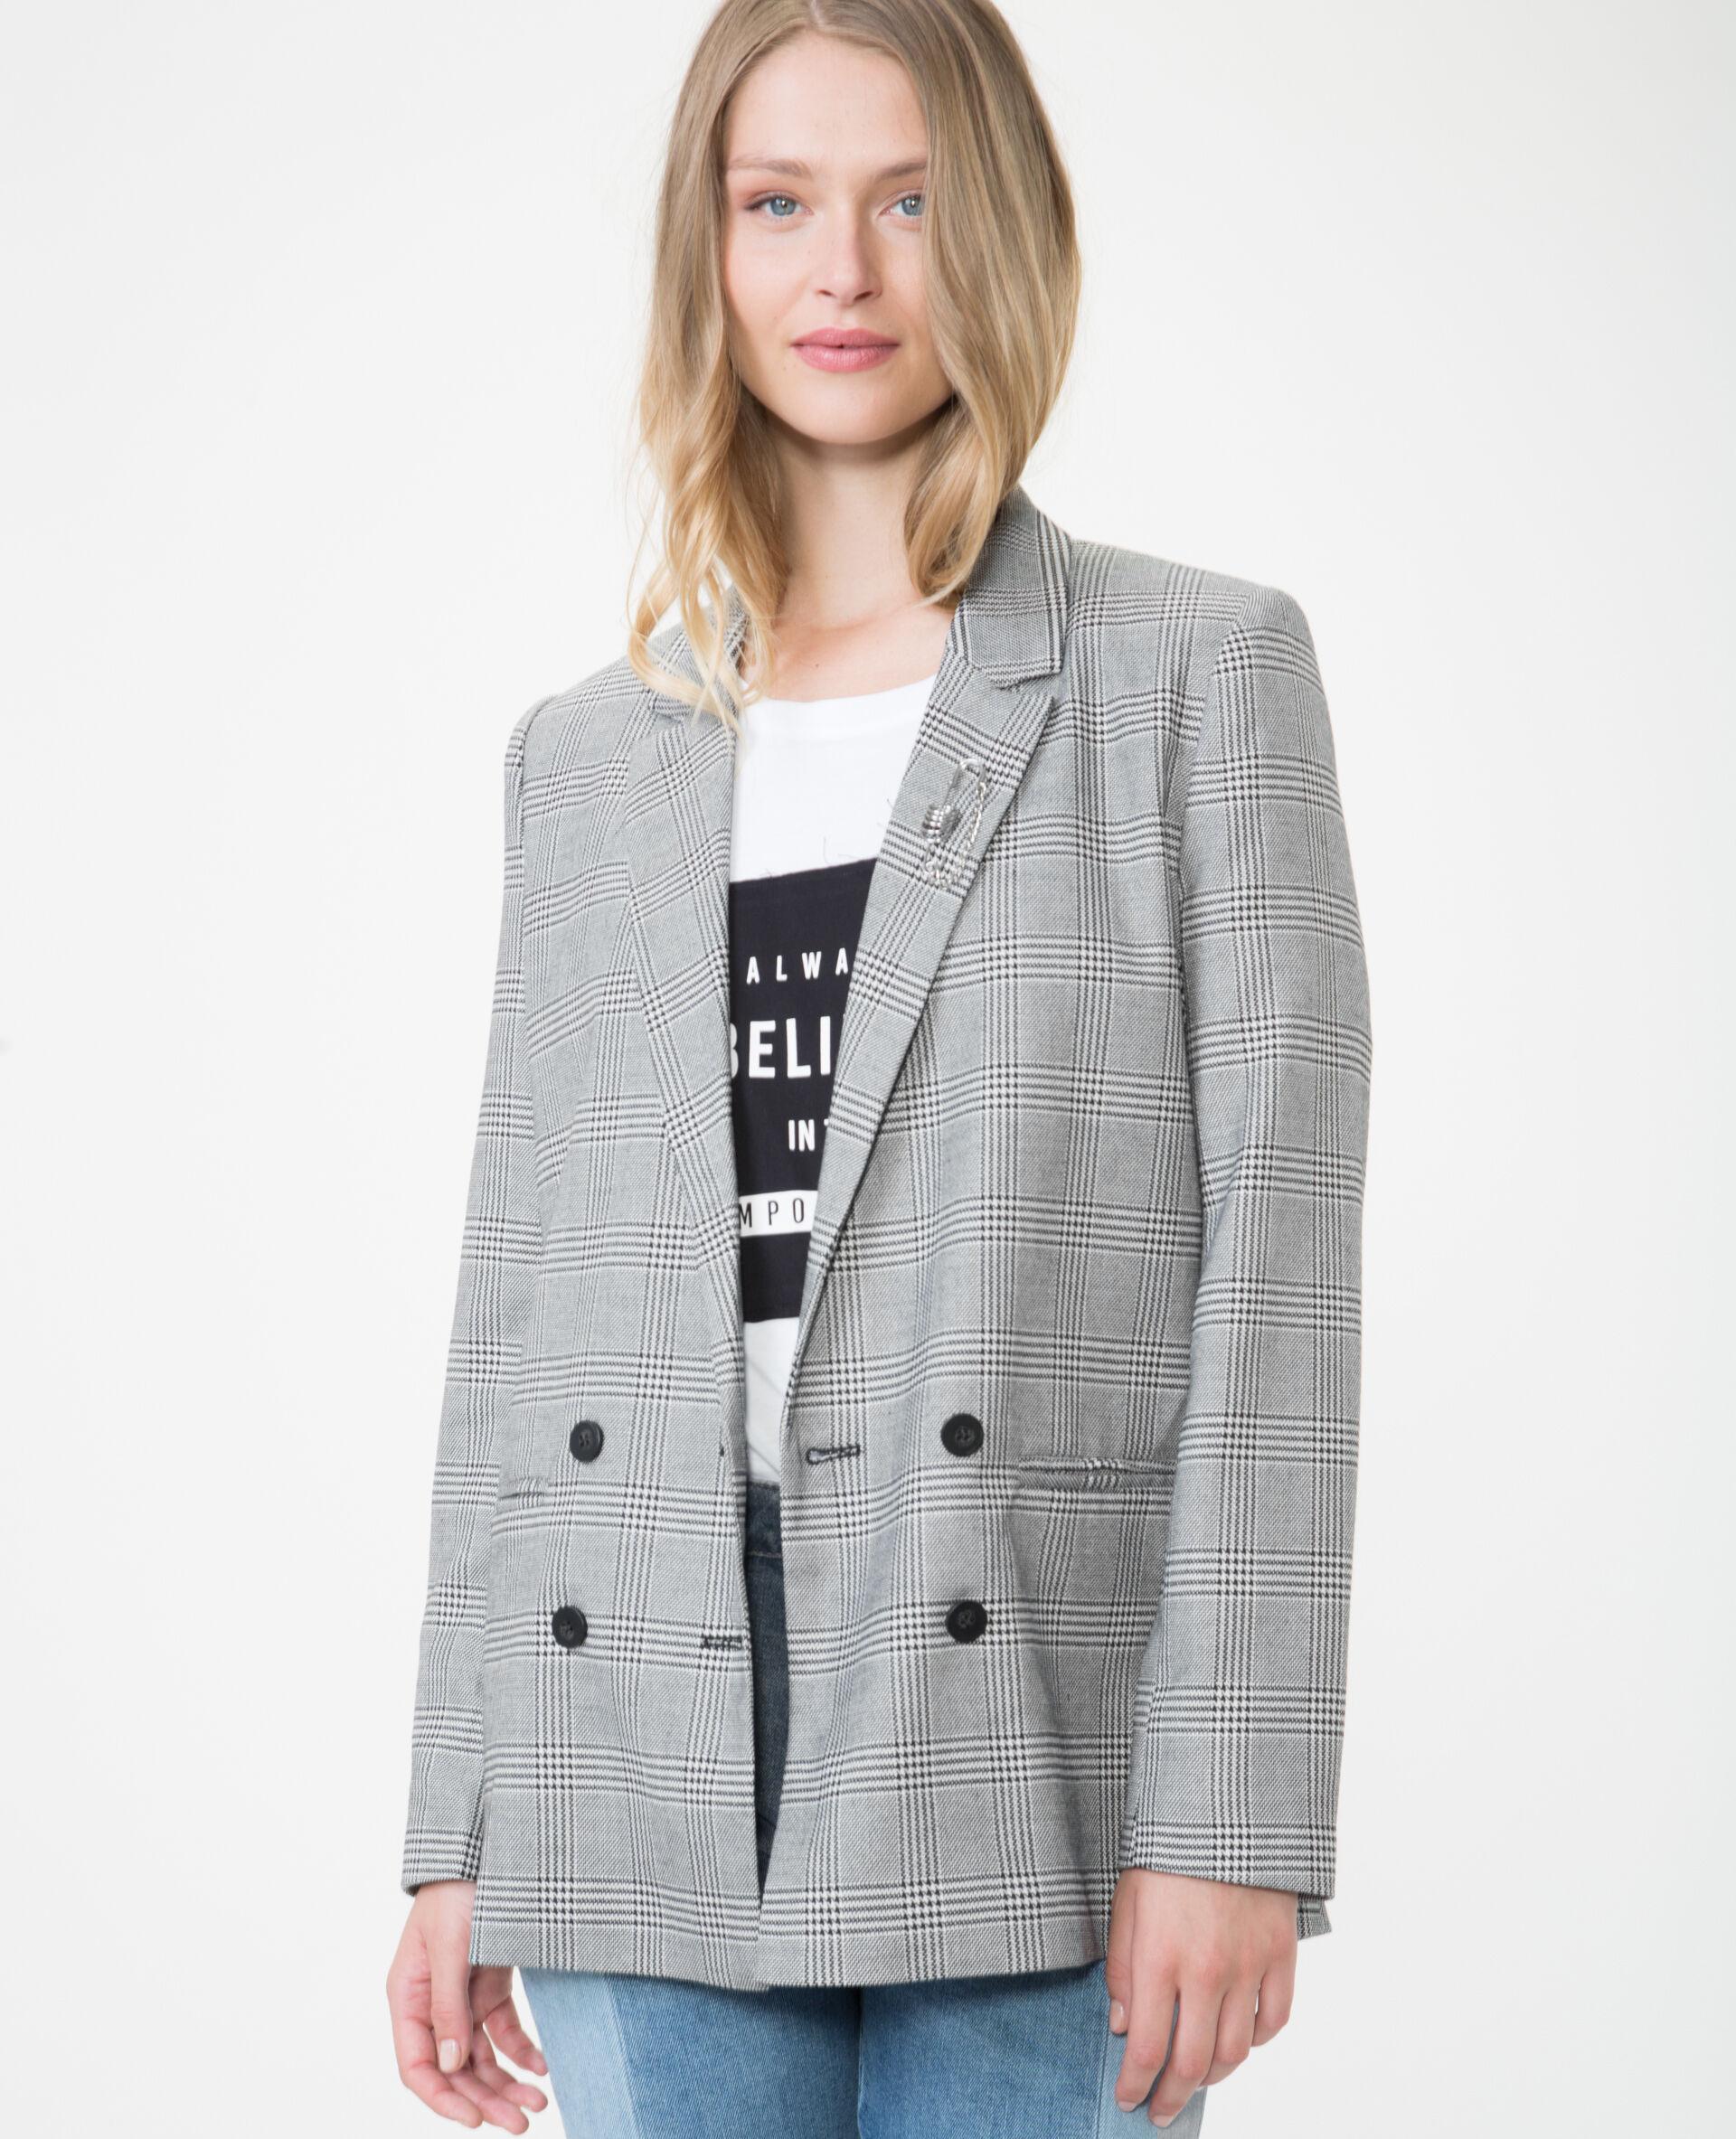 Veste blazer femme gris